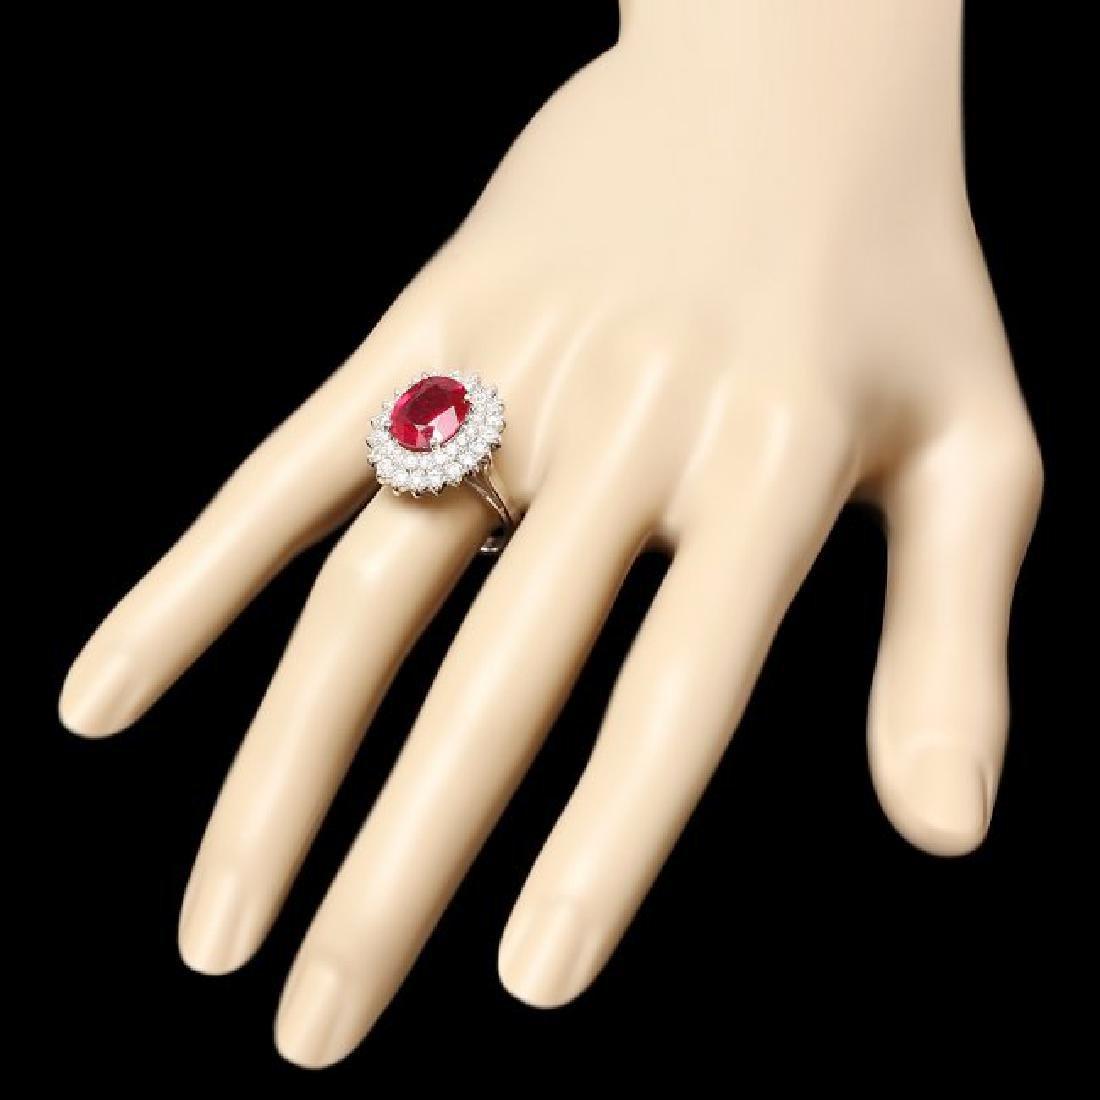 14k White Gold 4.50ct Ruby 1.40ct Diamond Ring - 3